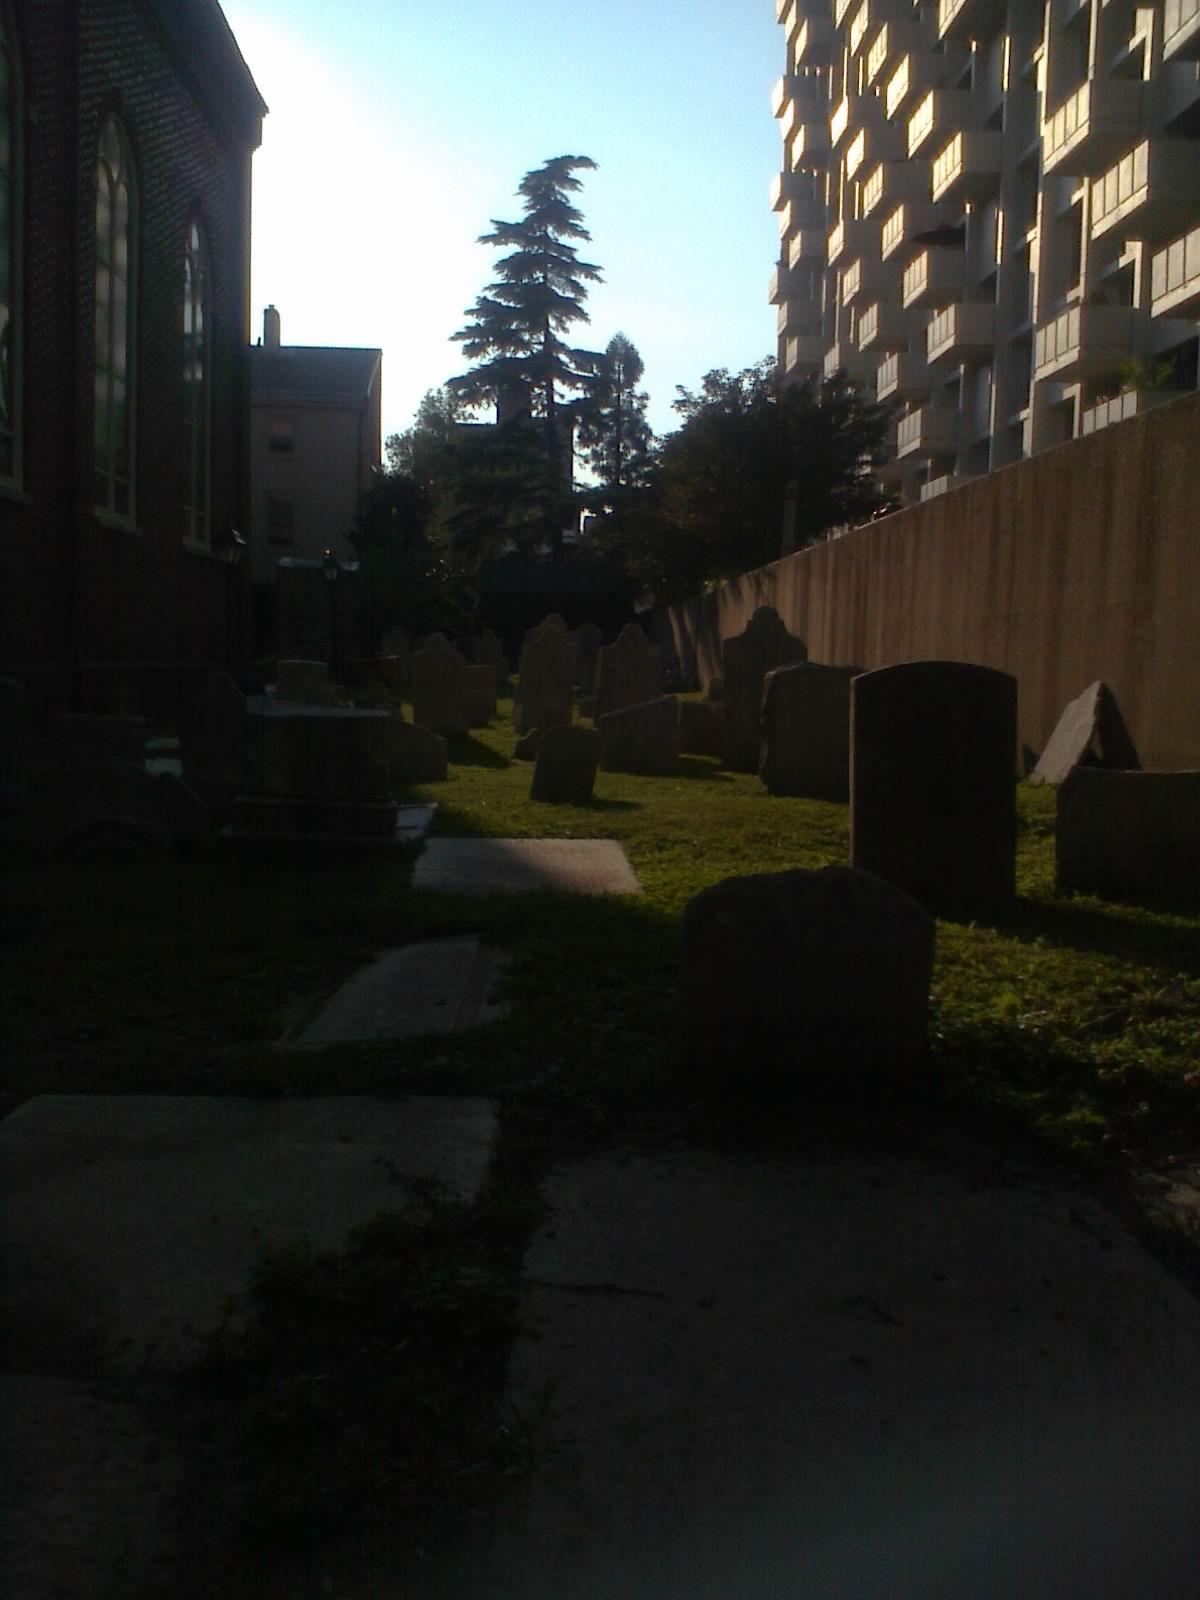 The graveyard of Holy Trinity German Catholic Church, 6th and Spruce Streets, Philadelphia.